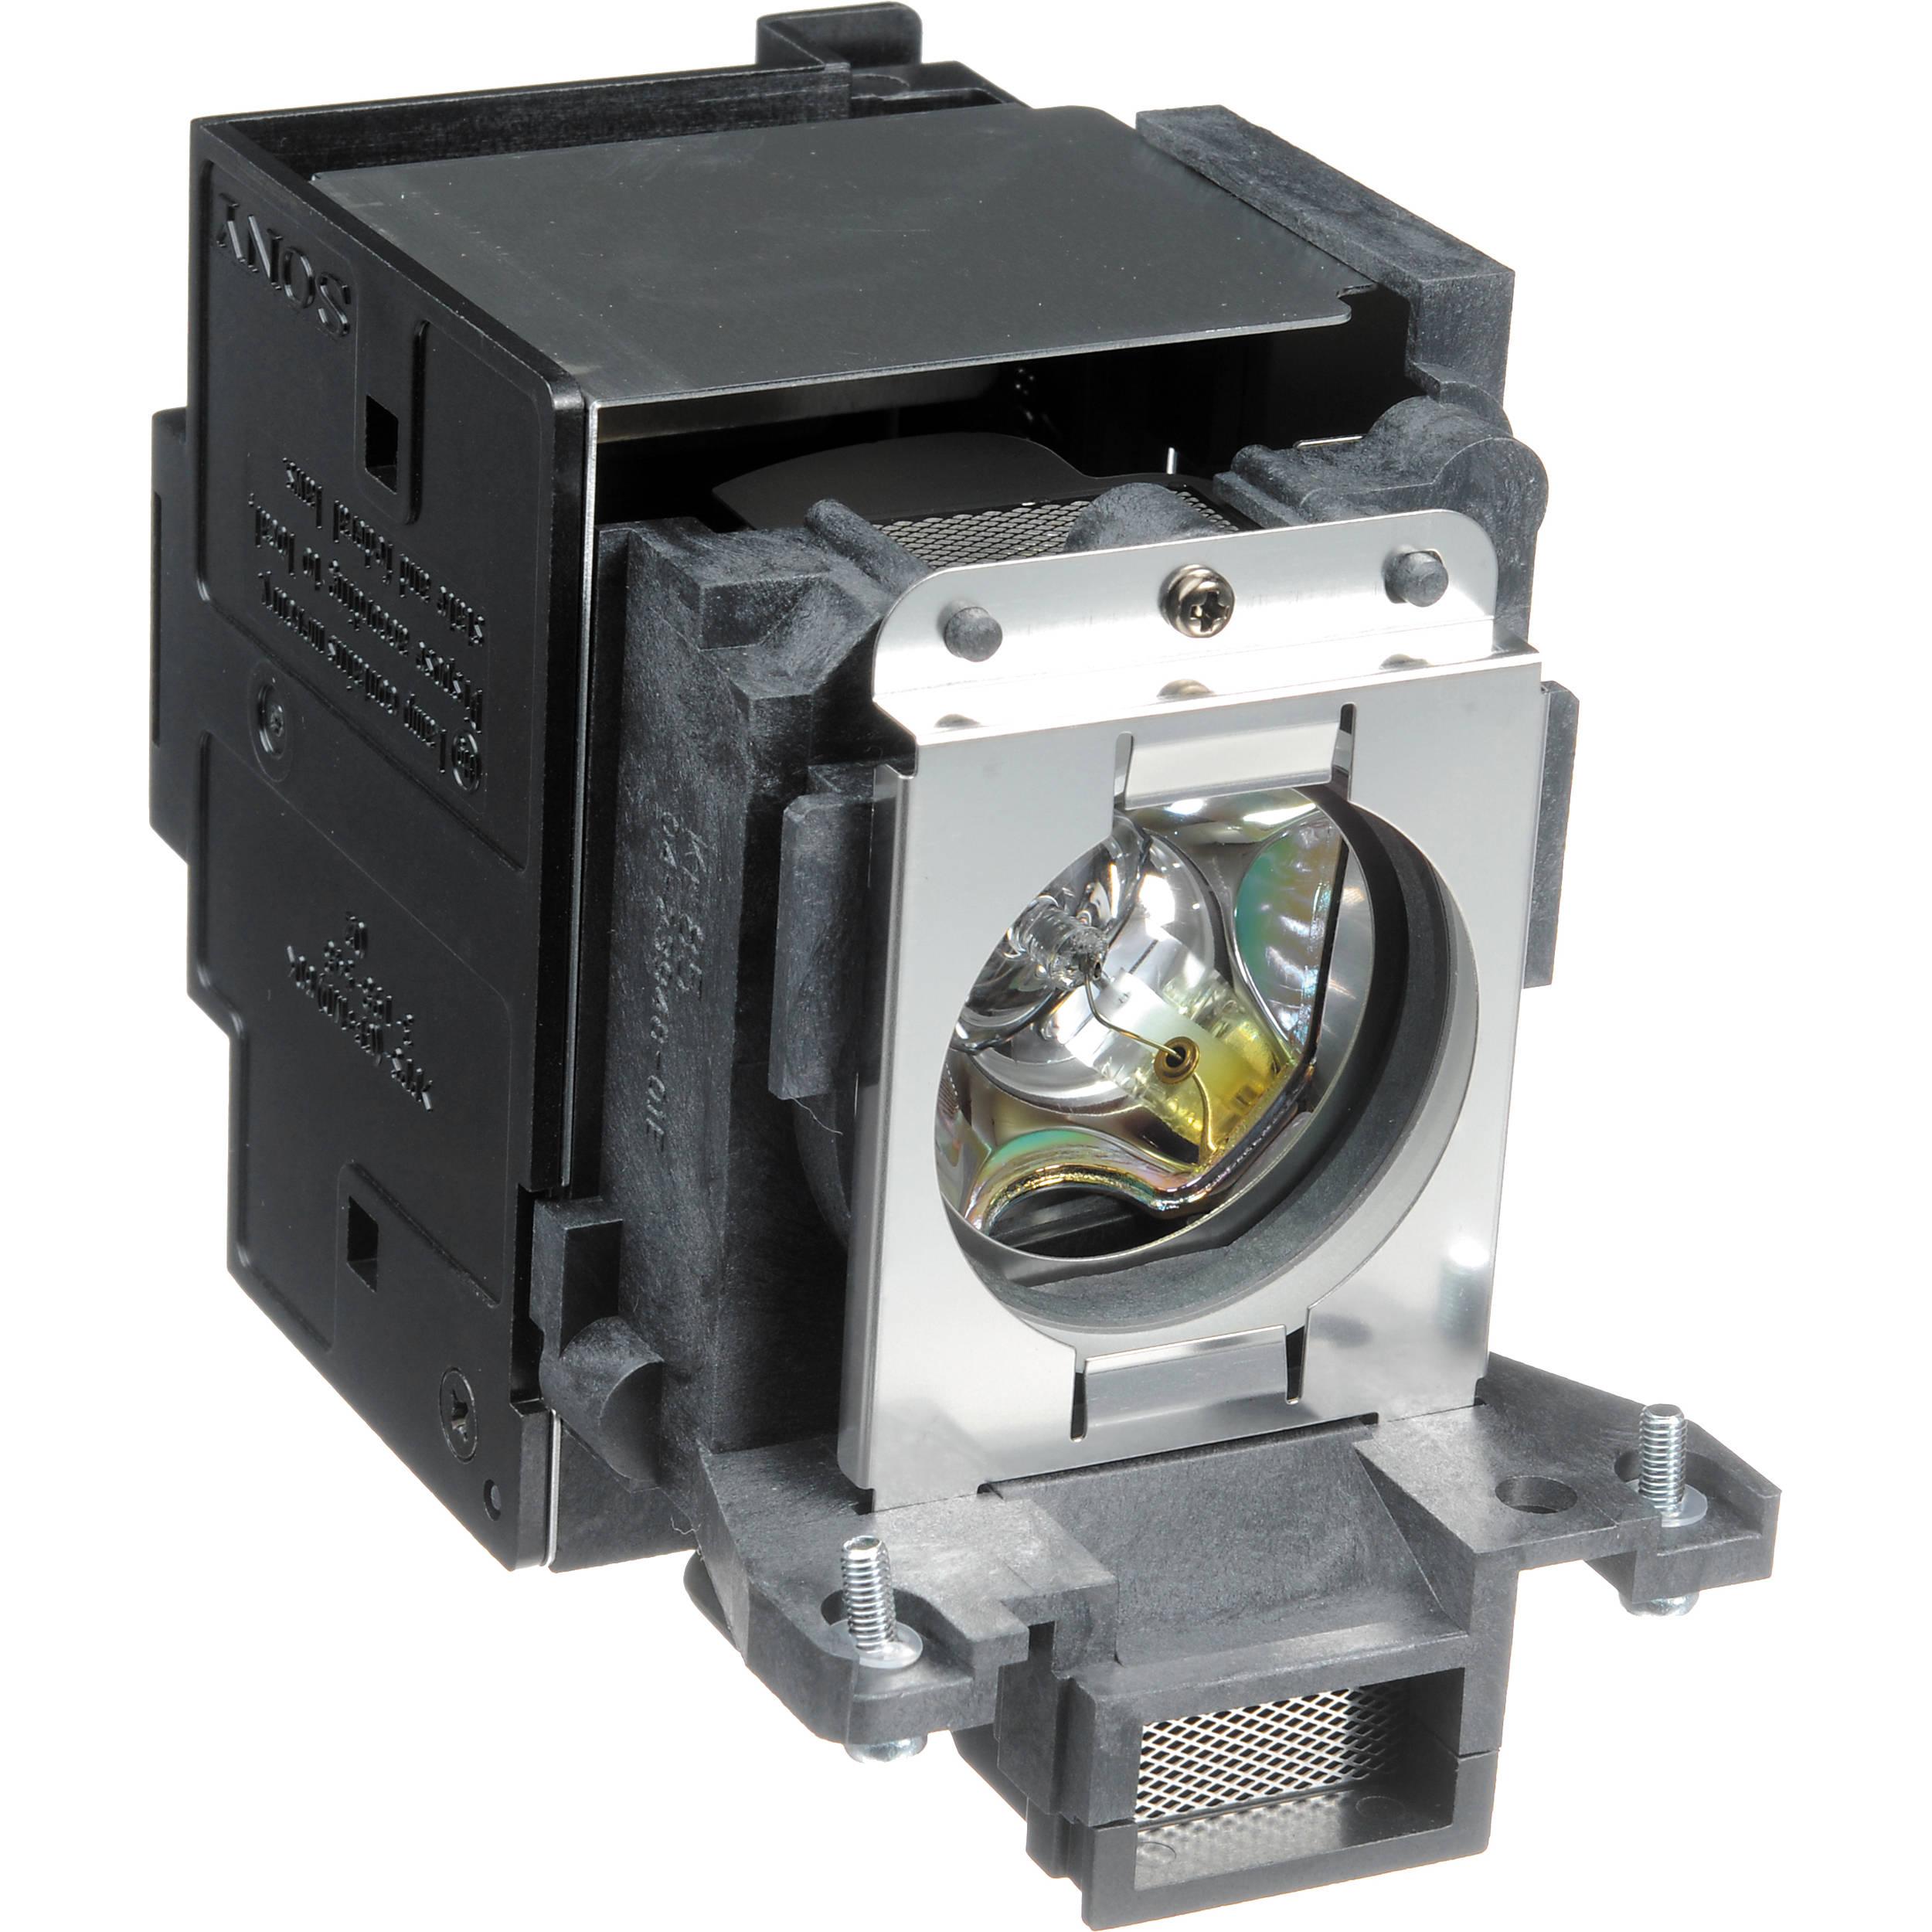 Sony LMP-C200 Projector Lamp LMP-C200 B&H Photo Video